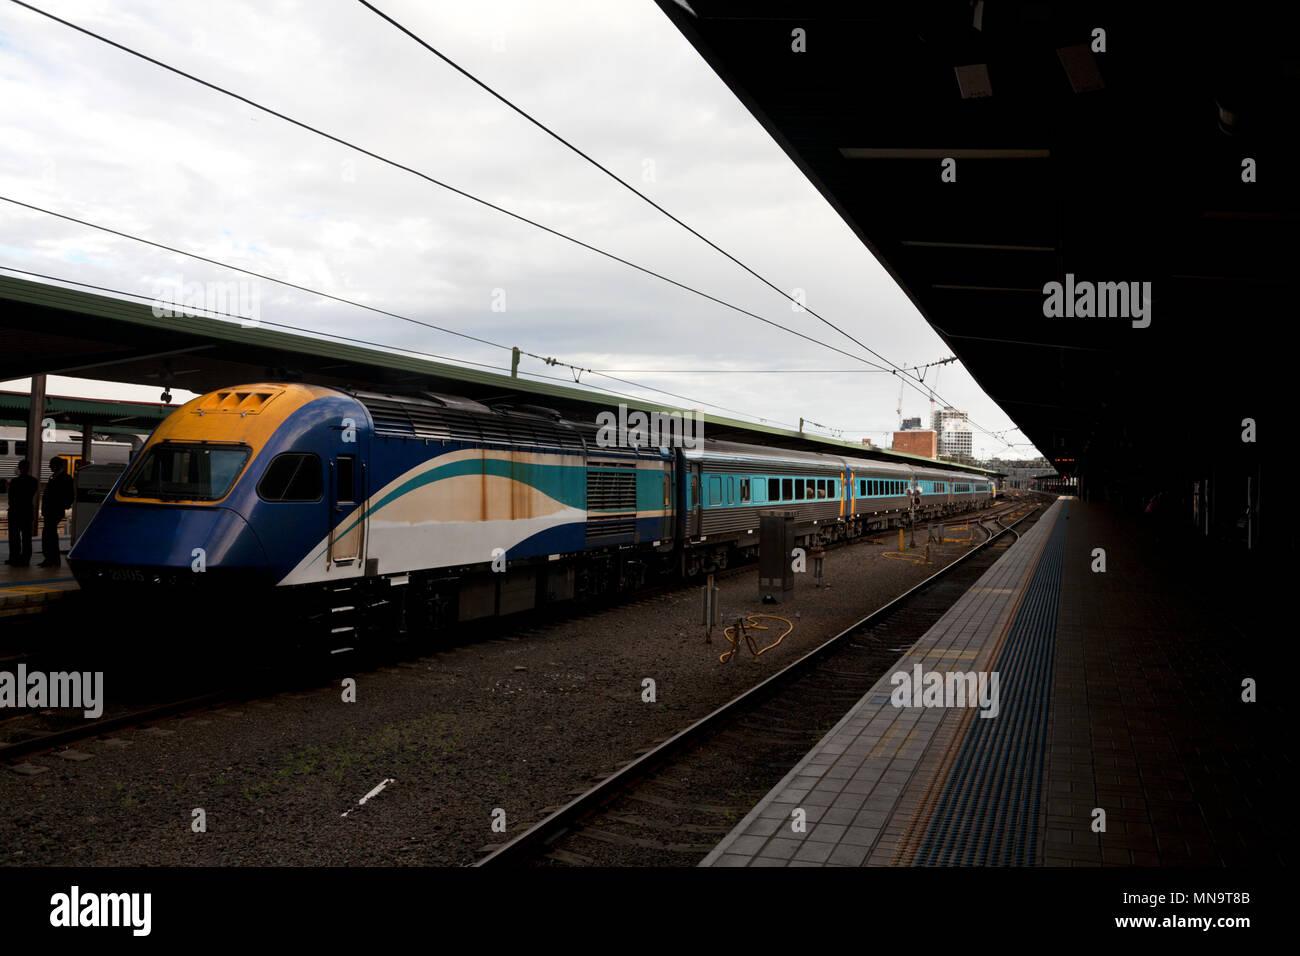 platform 2 central railway station  haymarket sydney new south wales australia - Stock Image